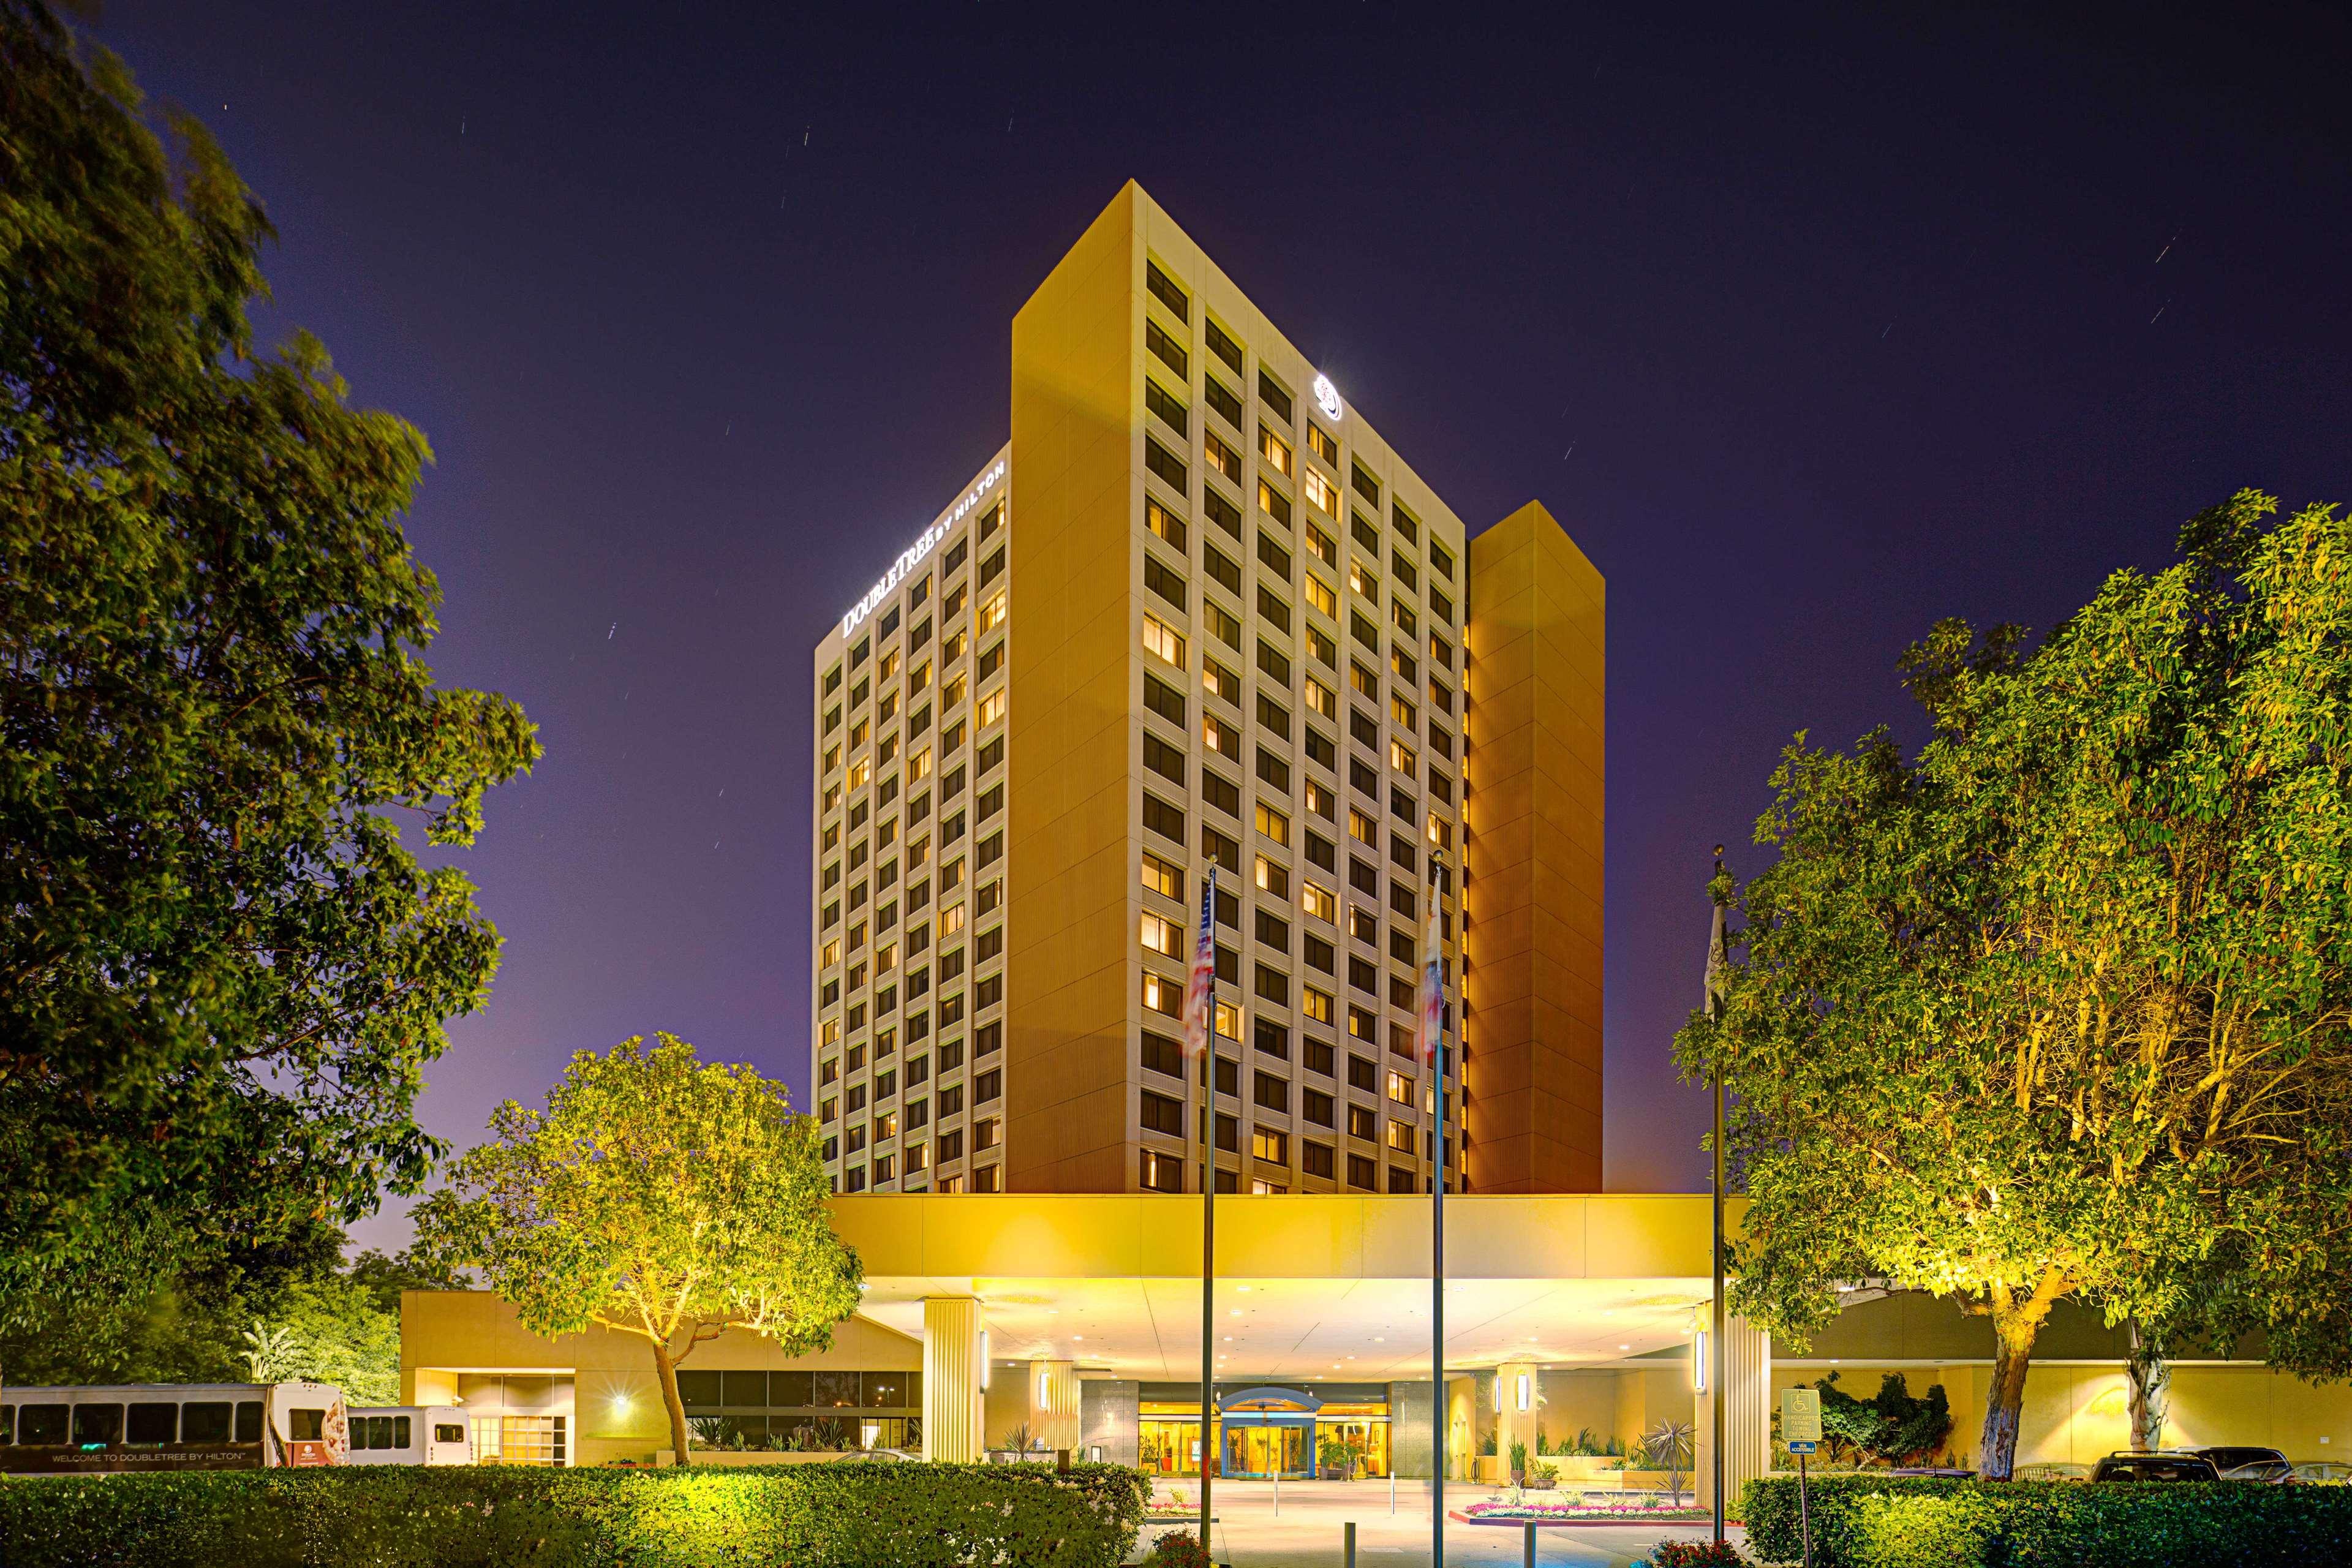 DoubleTree by Hilton Hotel Anaheim - Orange County image 5